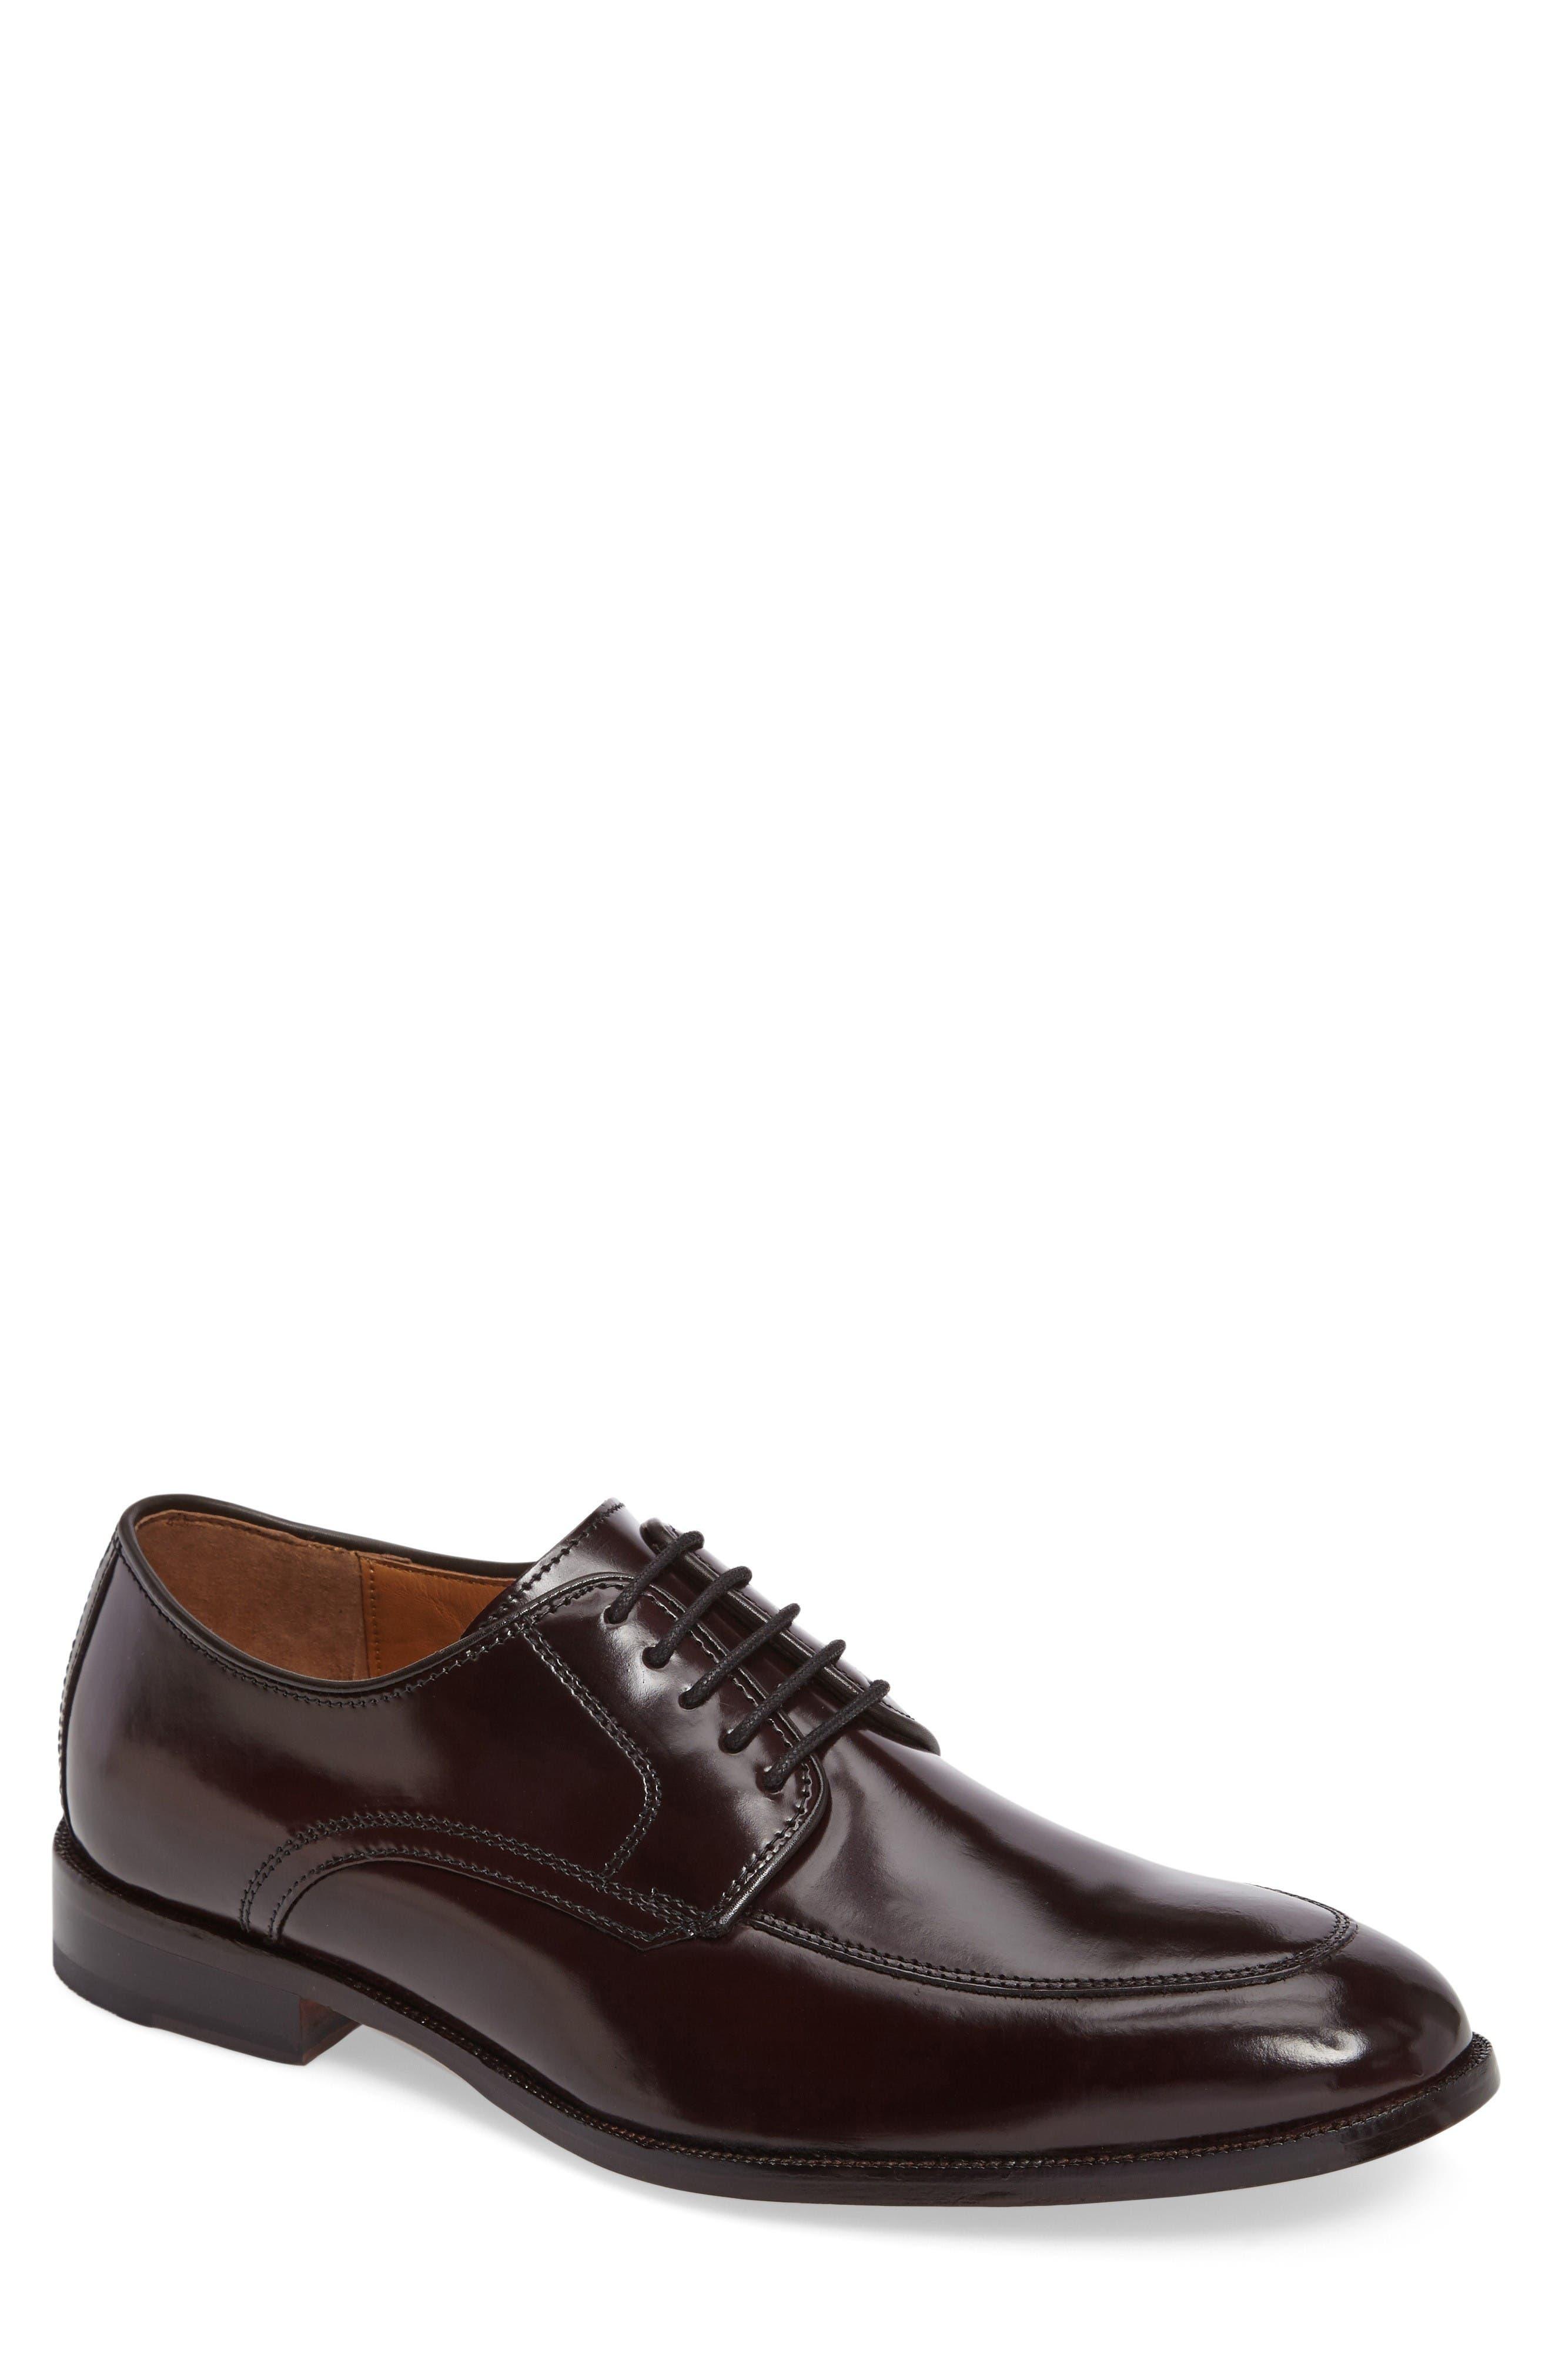 Bradford Apron-Toe Oxford,                             Alternate thumbnail 3, color,                             Burgundy Leather